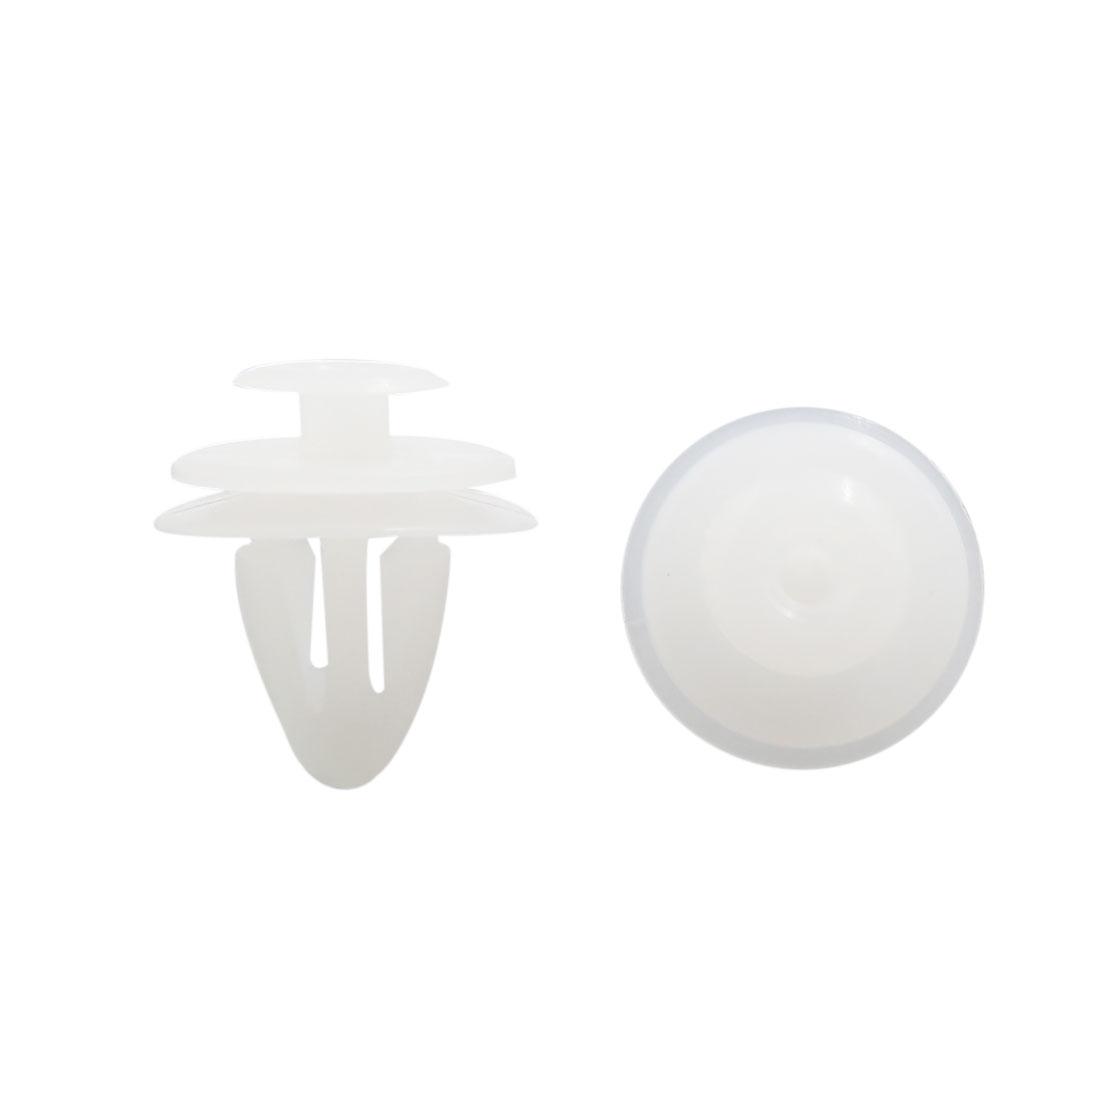 20 Pcs White Fastener Bumper Push Clips Plastic Rivets 10mm x 12mm x 17mm